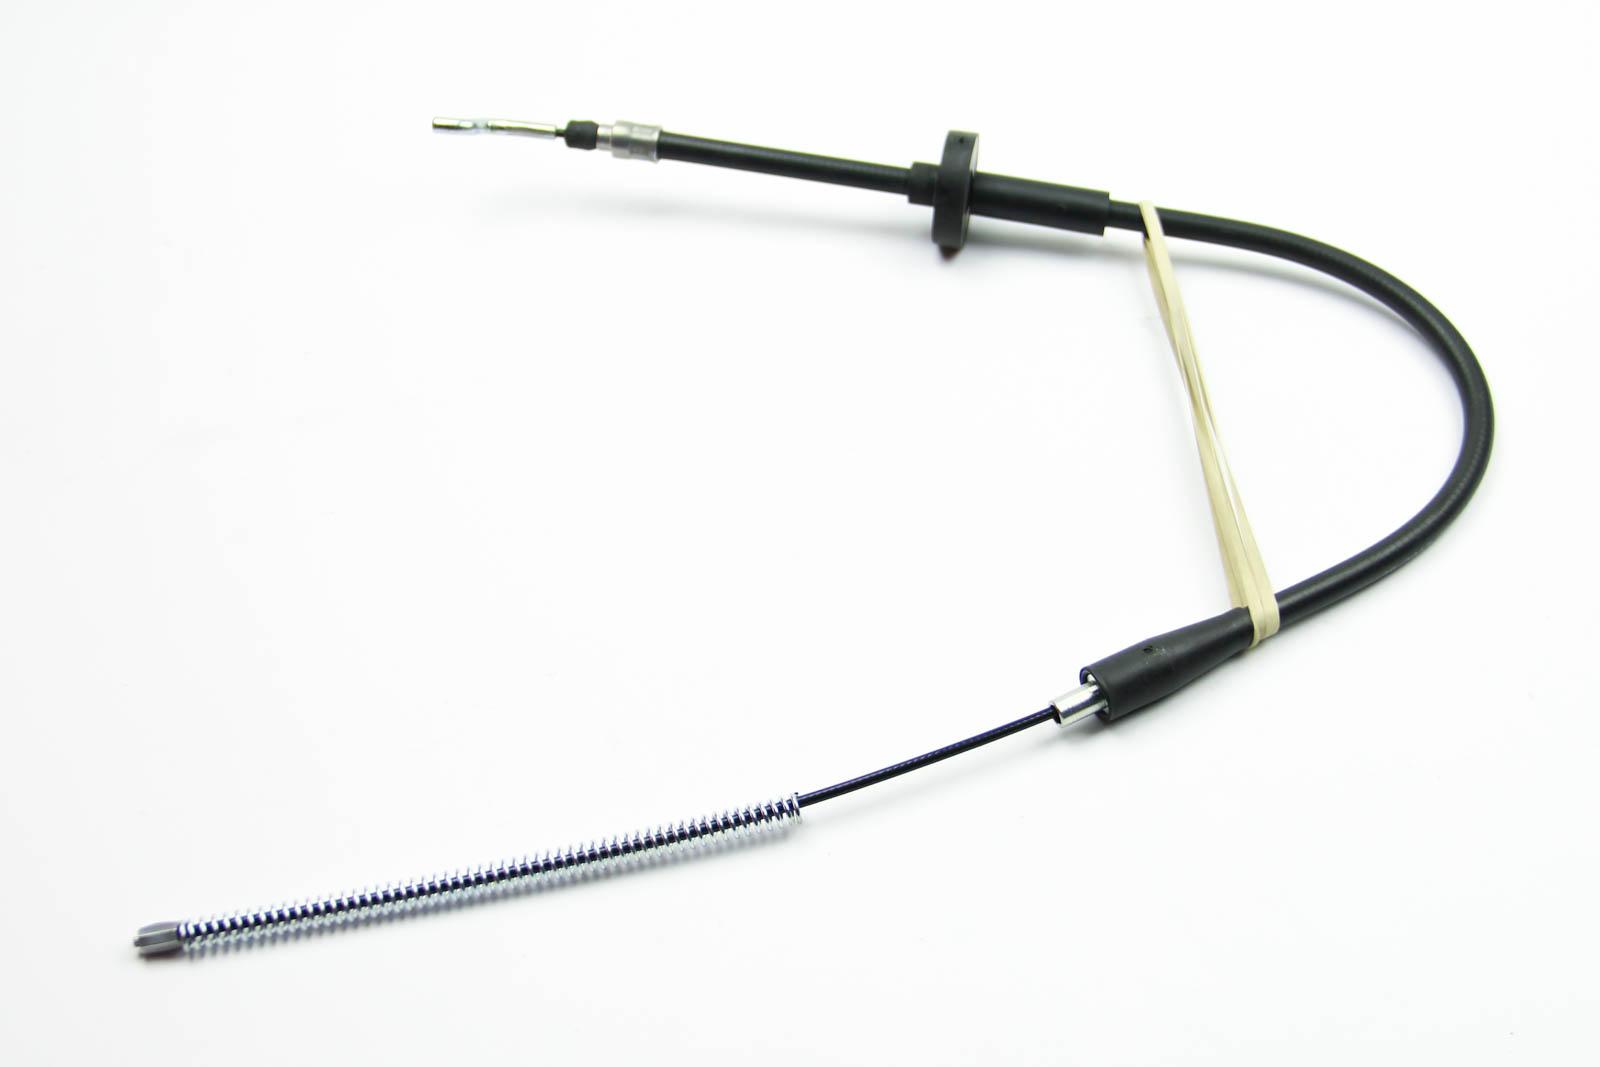 Трос ручного тормоза зад. T4 -96 Л=Пр. (барабан) (844/506)